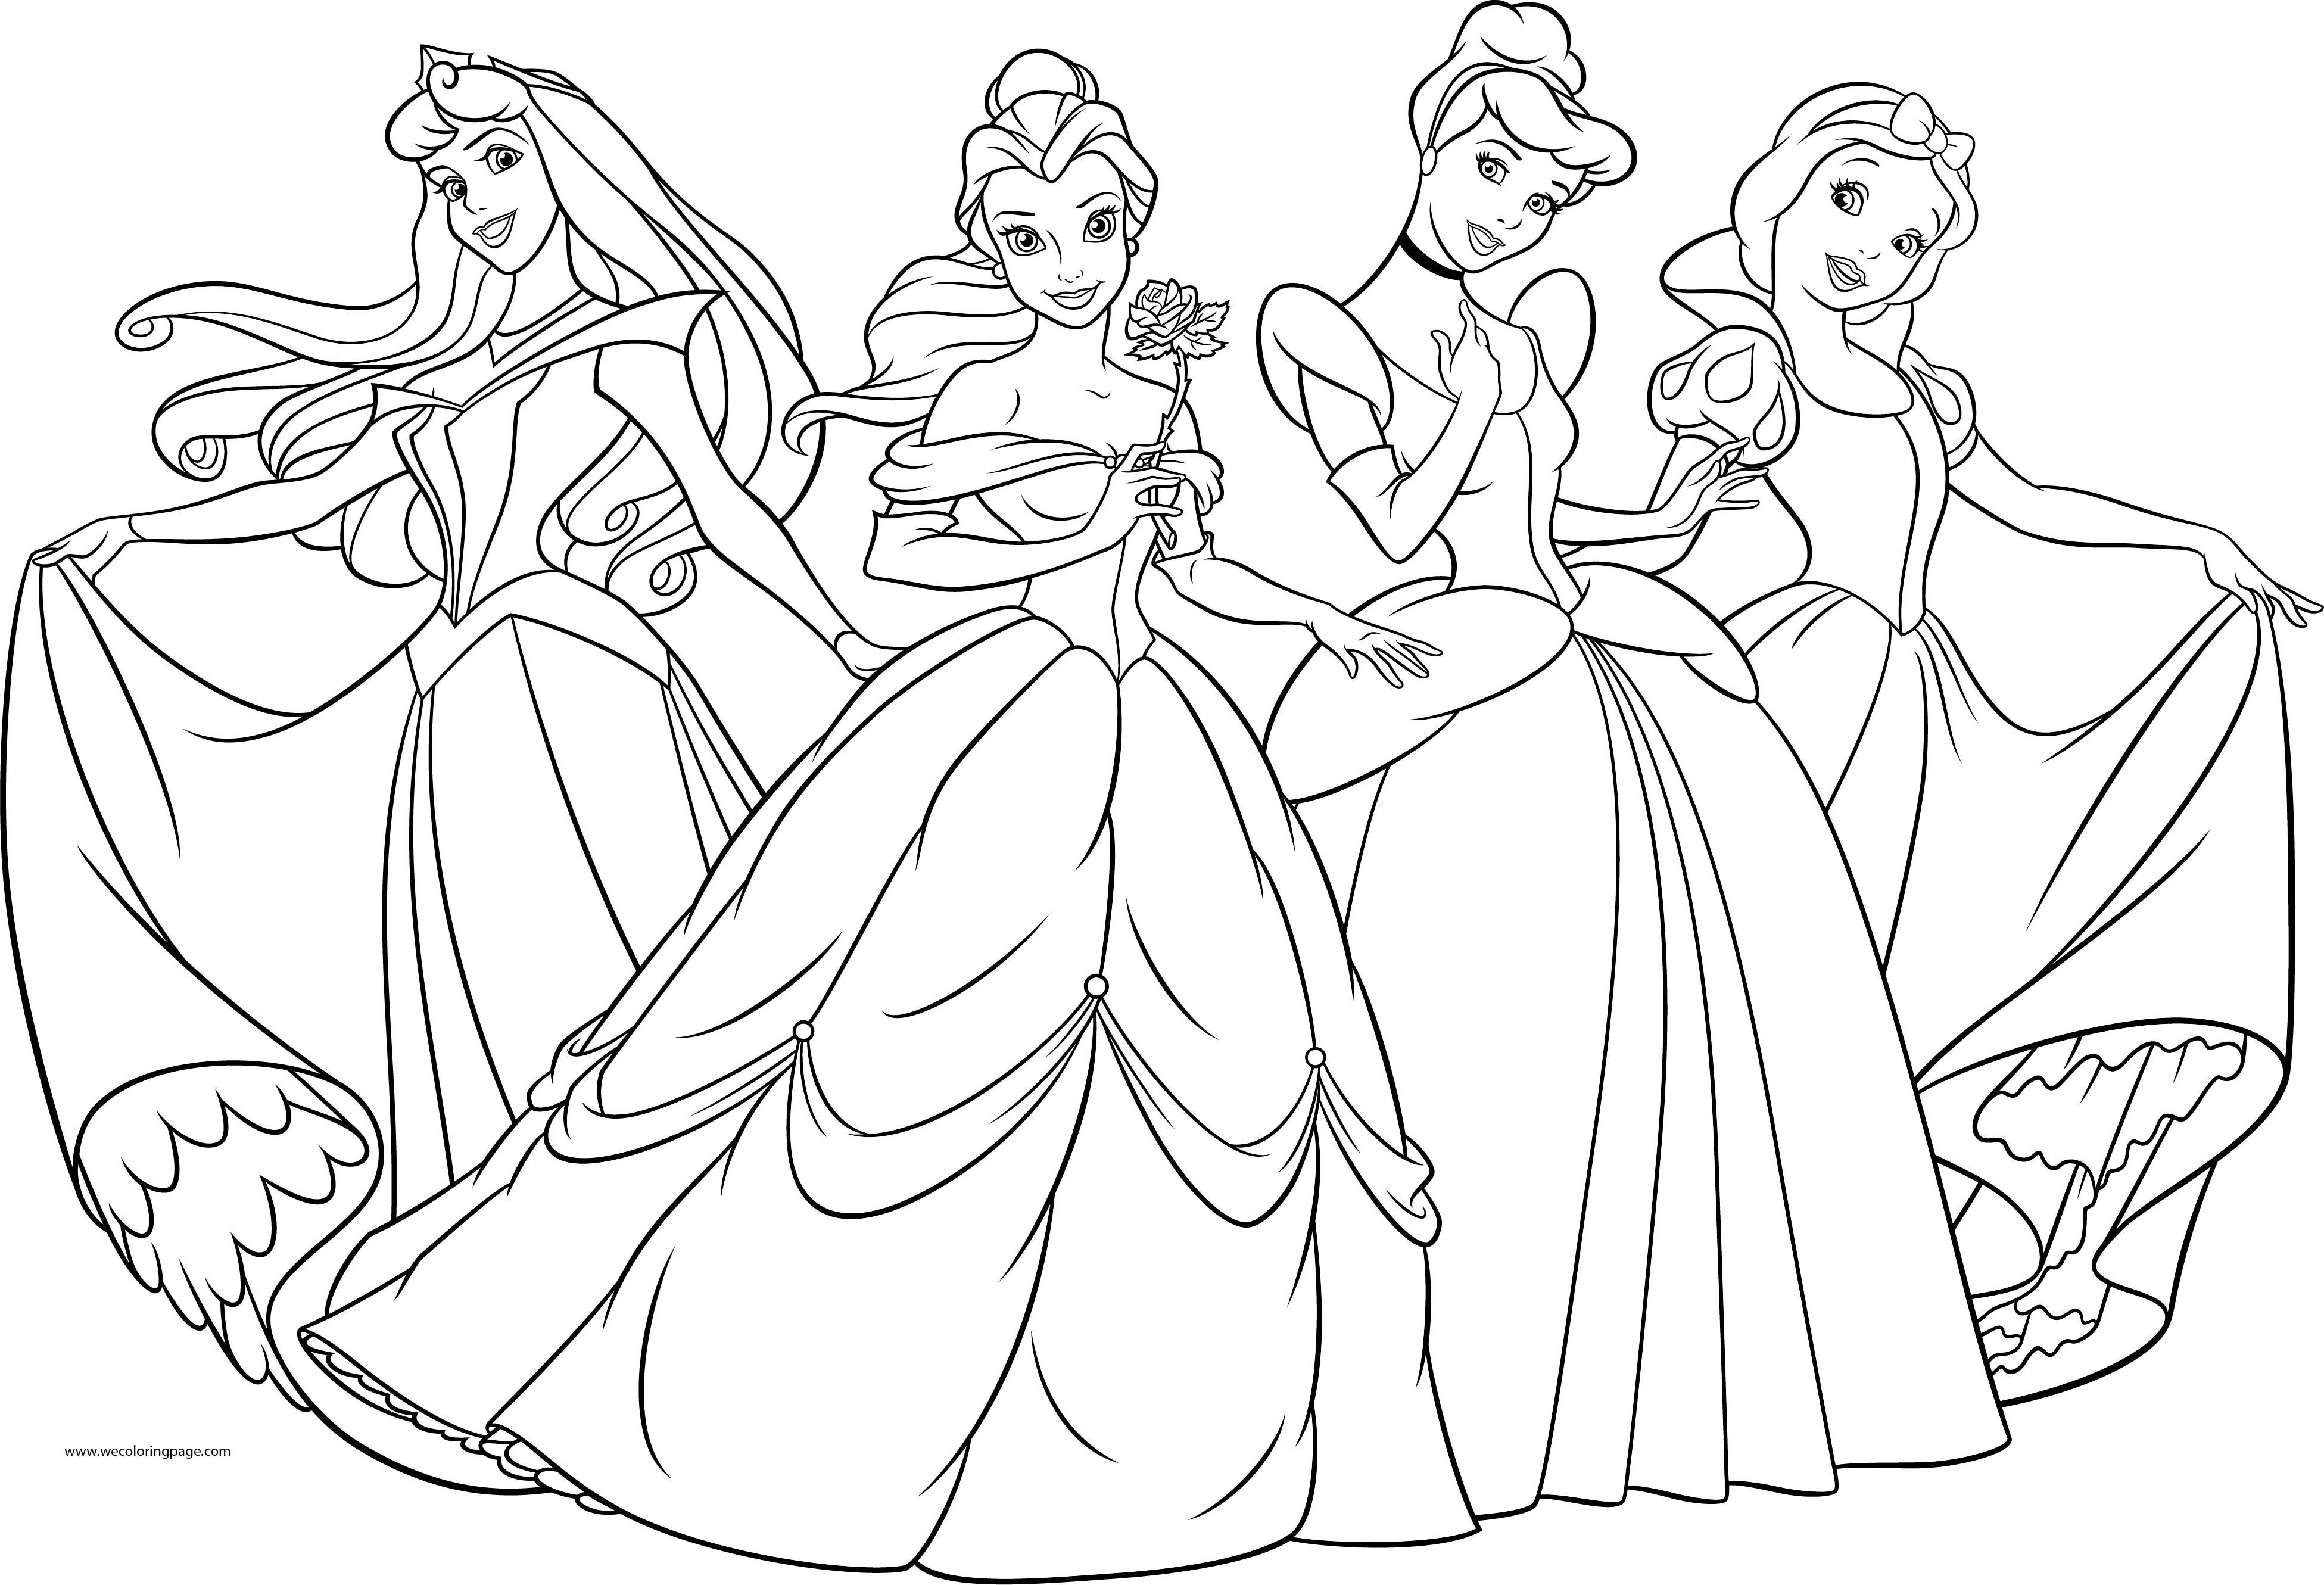 Four Disney Princess Coloring Page